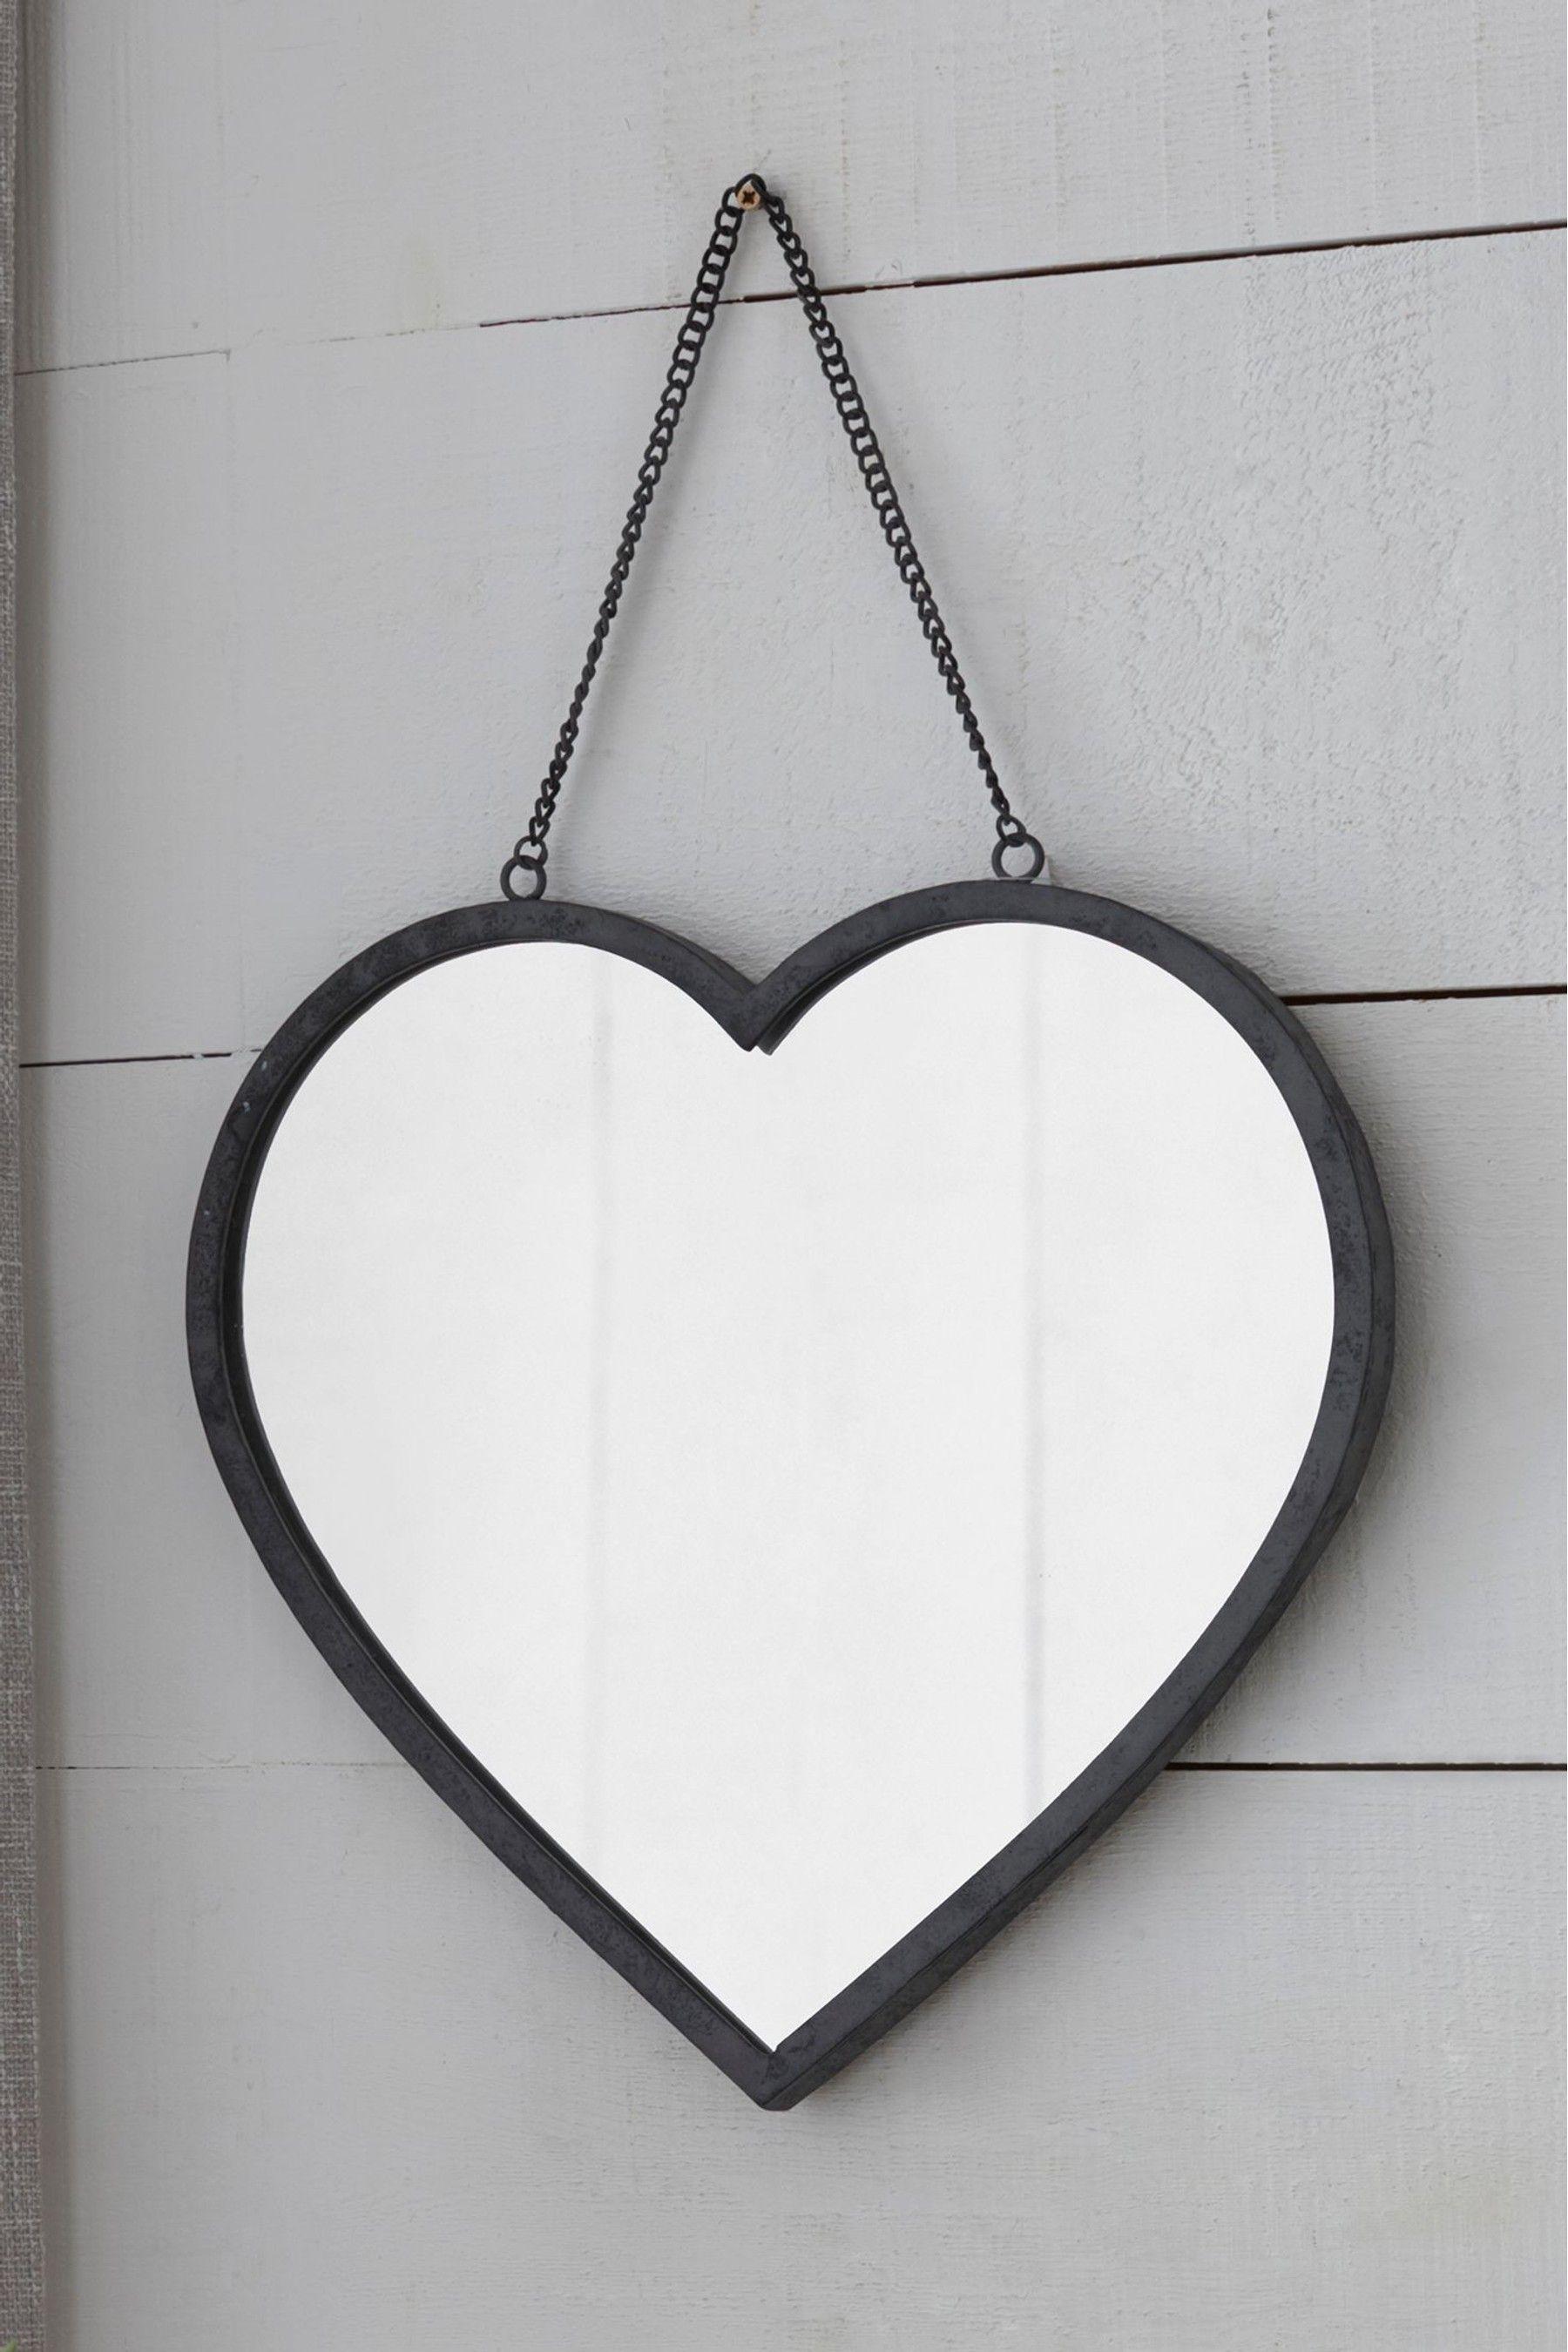 Vintage Effect Heart Mirror In 2020 Heart Mirror Mirror Overmantle Mirror